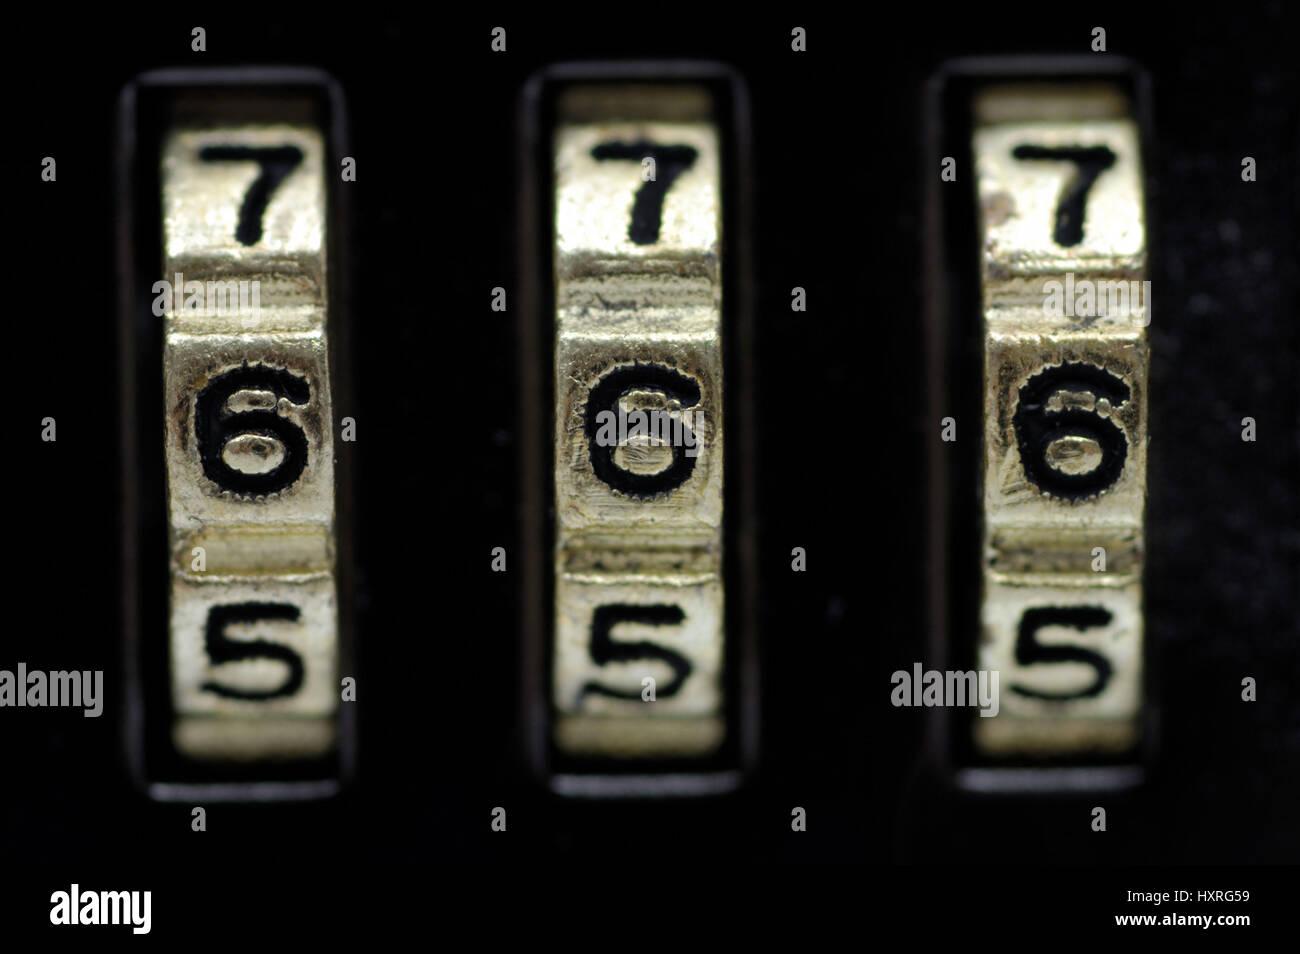 Combination lock, combination locks, secret, secrets, castle, castles, figures, number, numbers, numerical order, - Stock Image